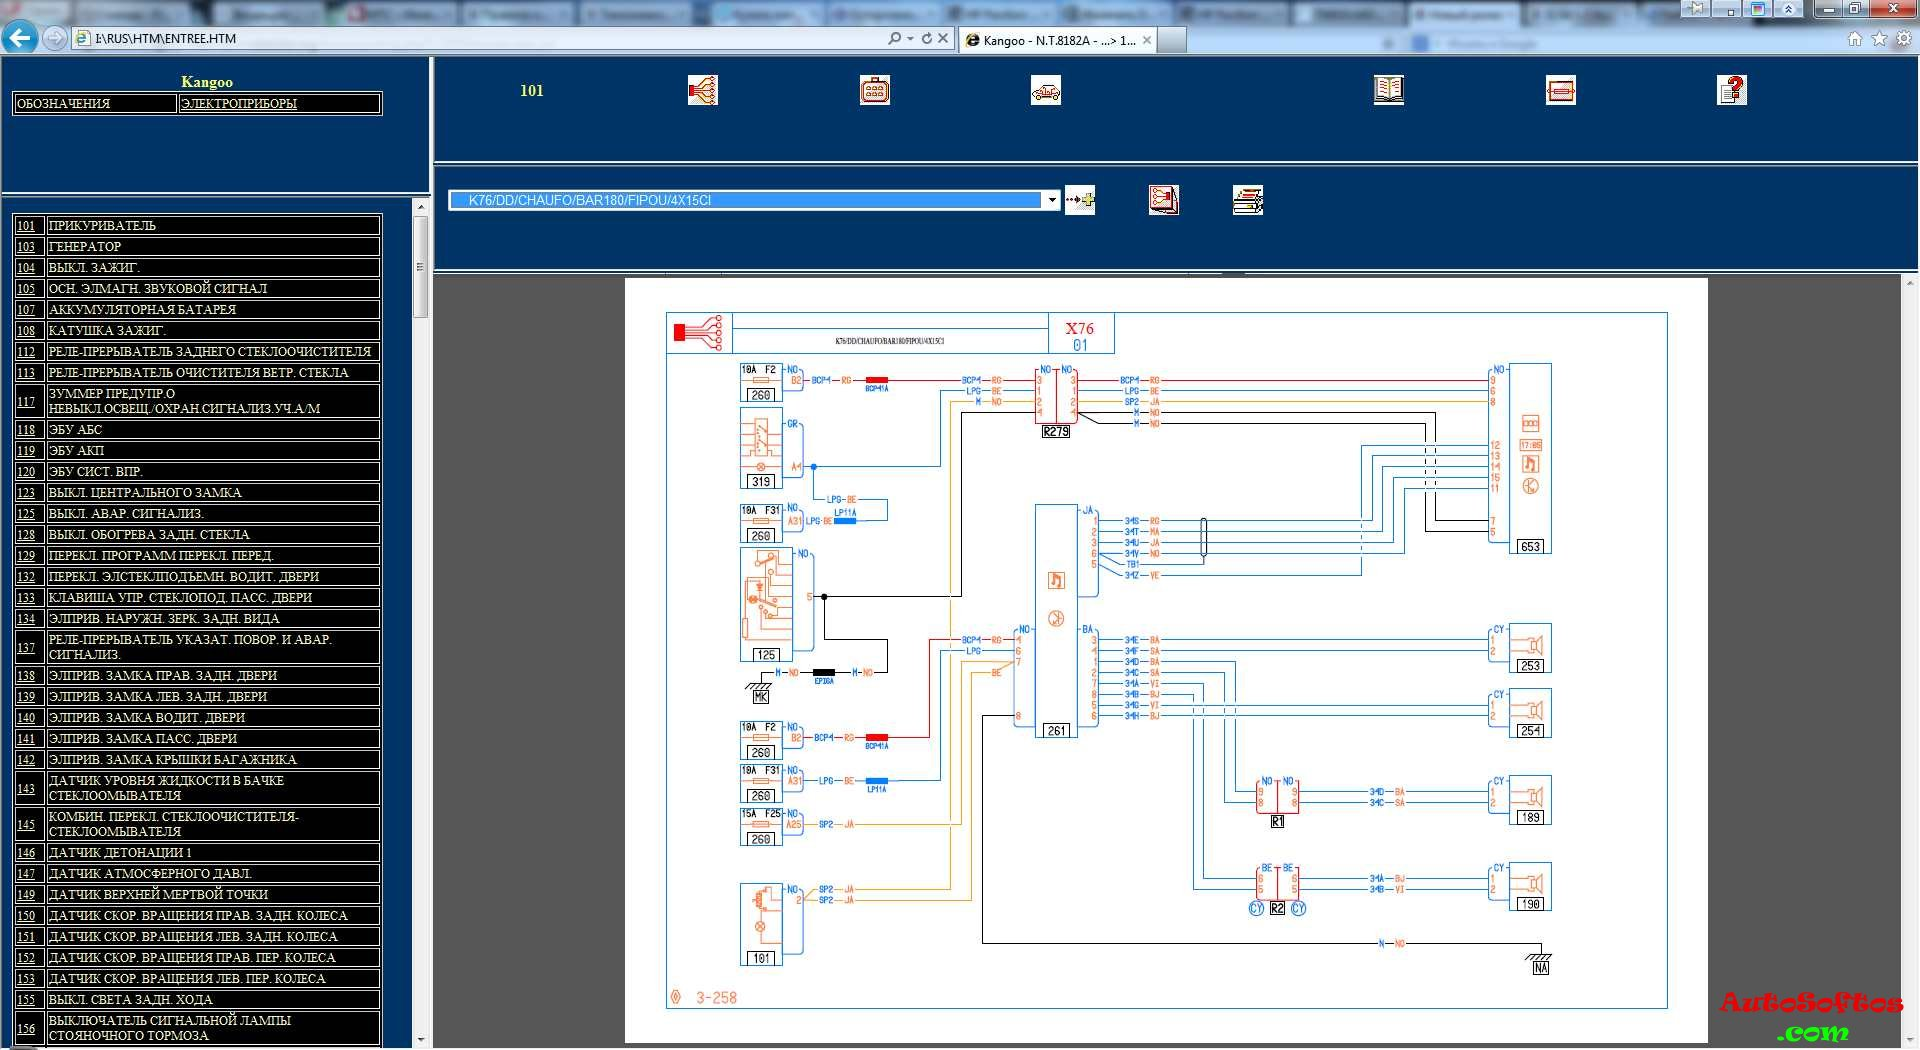 Renault Wiring Diagrams / Renault электросхемы. Только русский язык [2009,  HTML, RUS